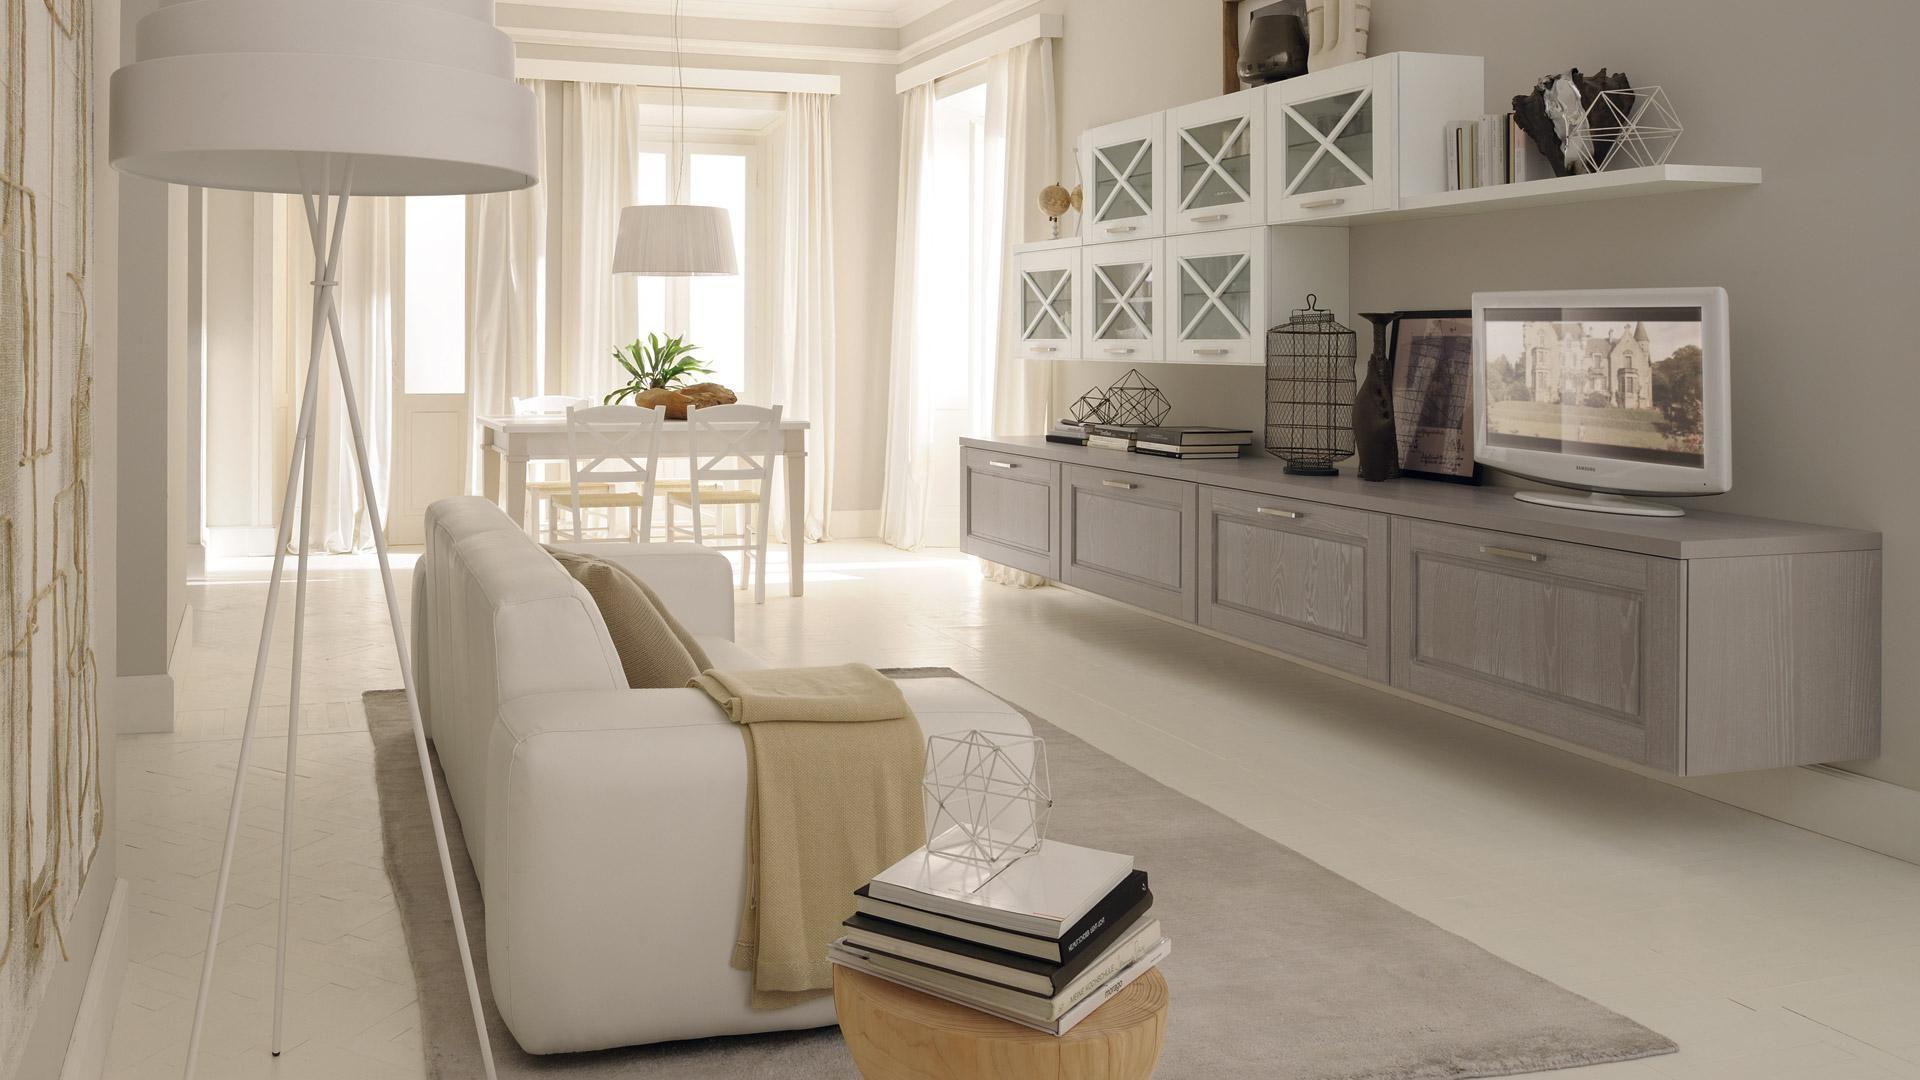 Agnese - Cucine Classiche - Cucine Lube | Nápady do domu | Pinterest ...